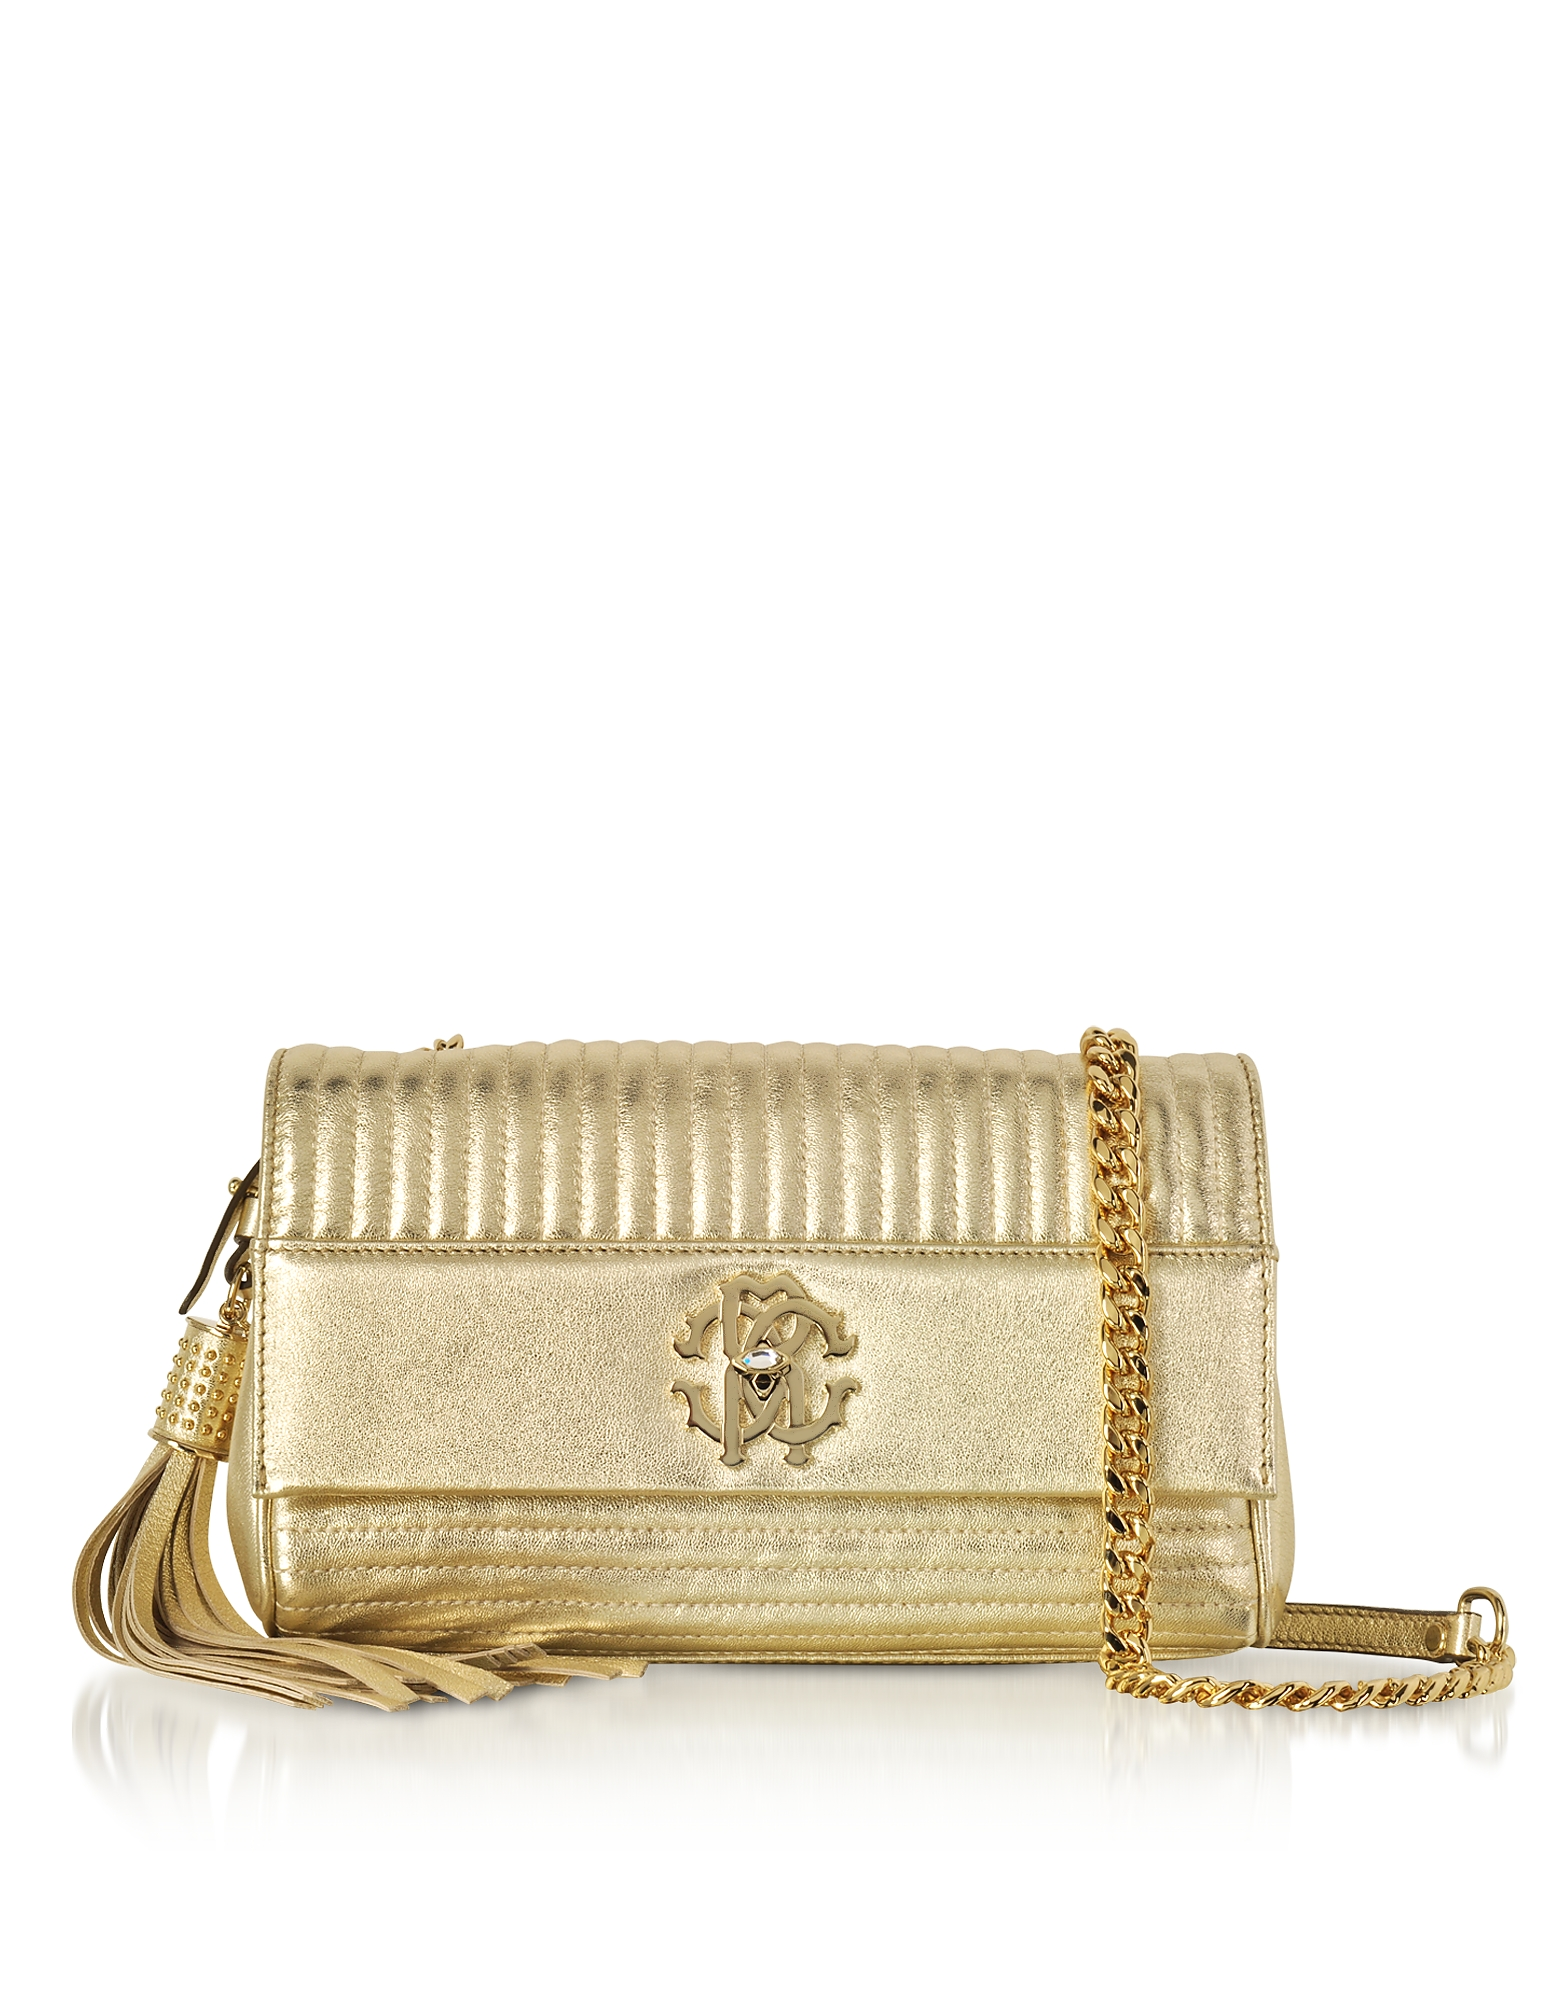 Roberto Cavalli Handbags, Platinum Gold Laminated Quilted Nappa Leather Small Shoulder Bag